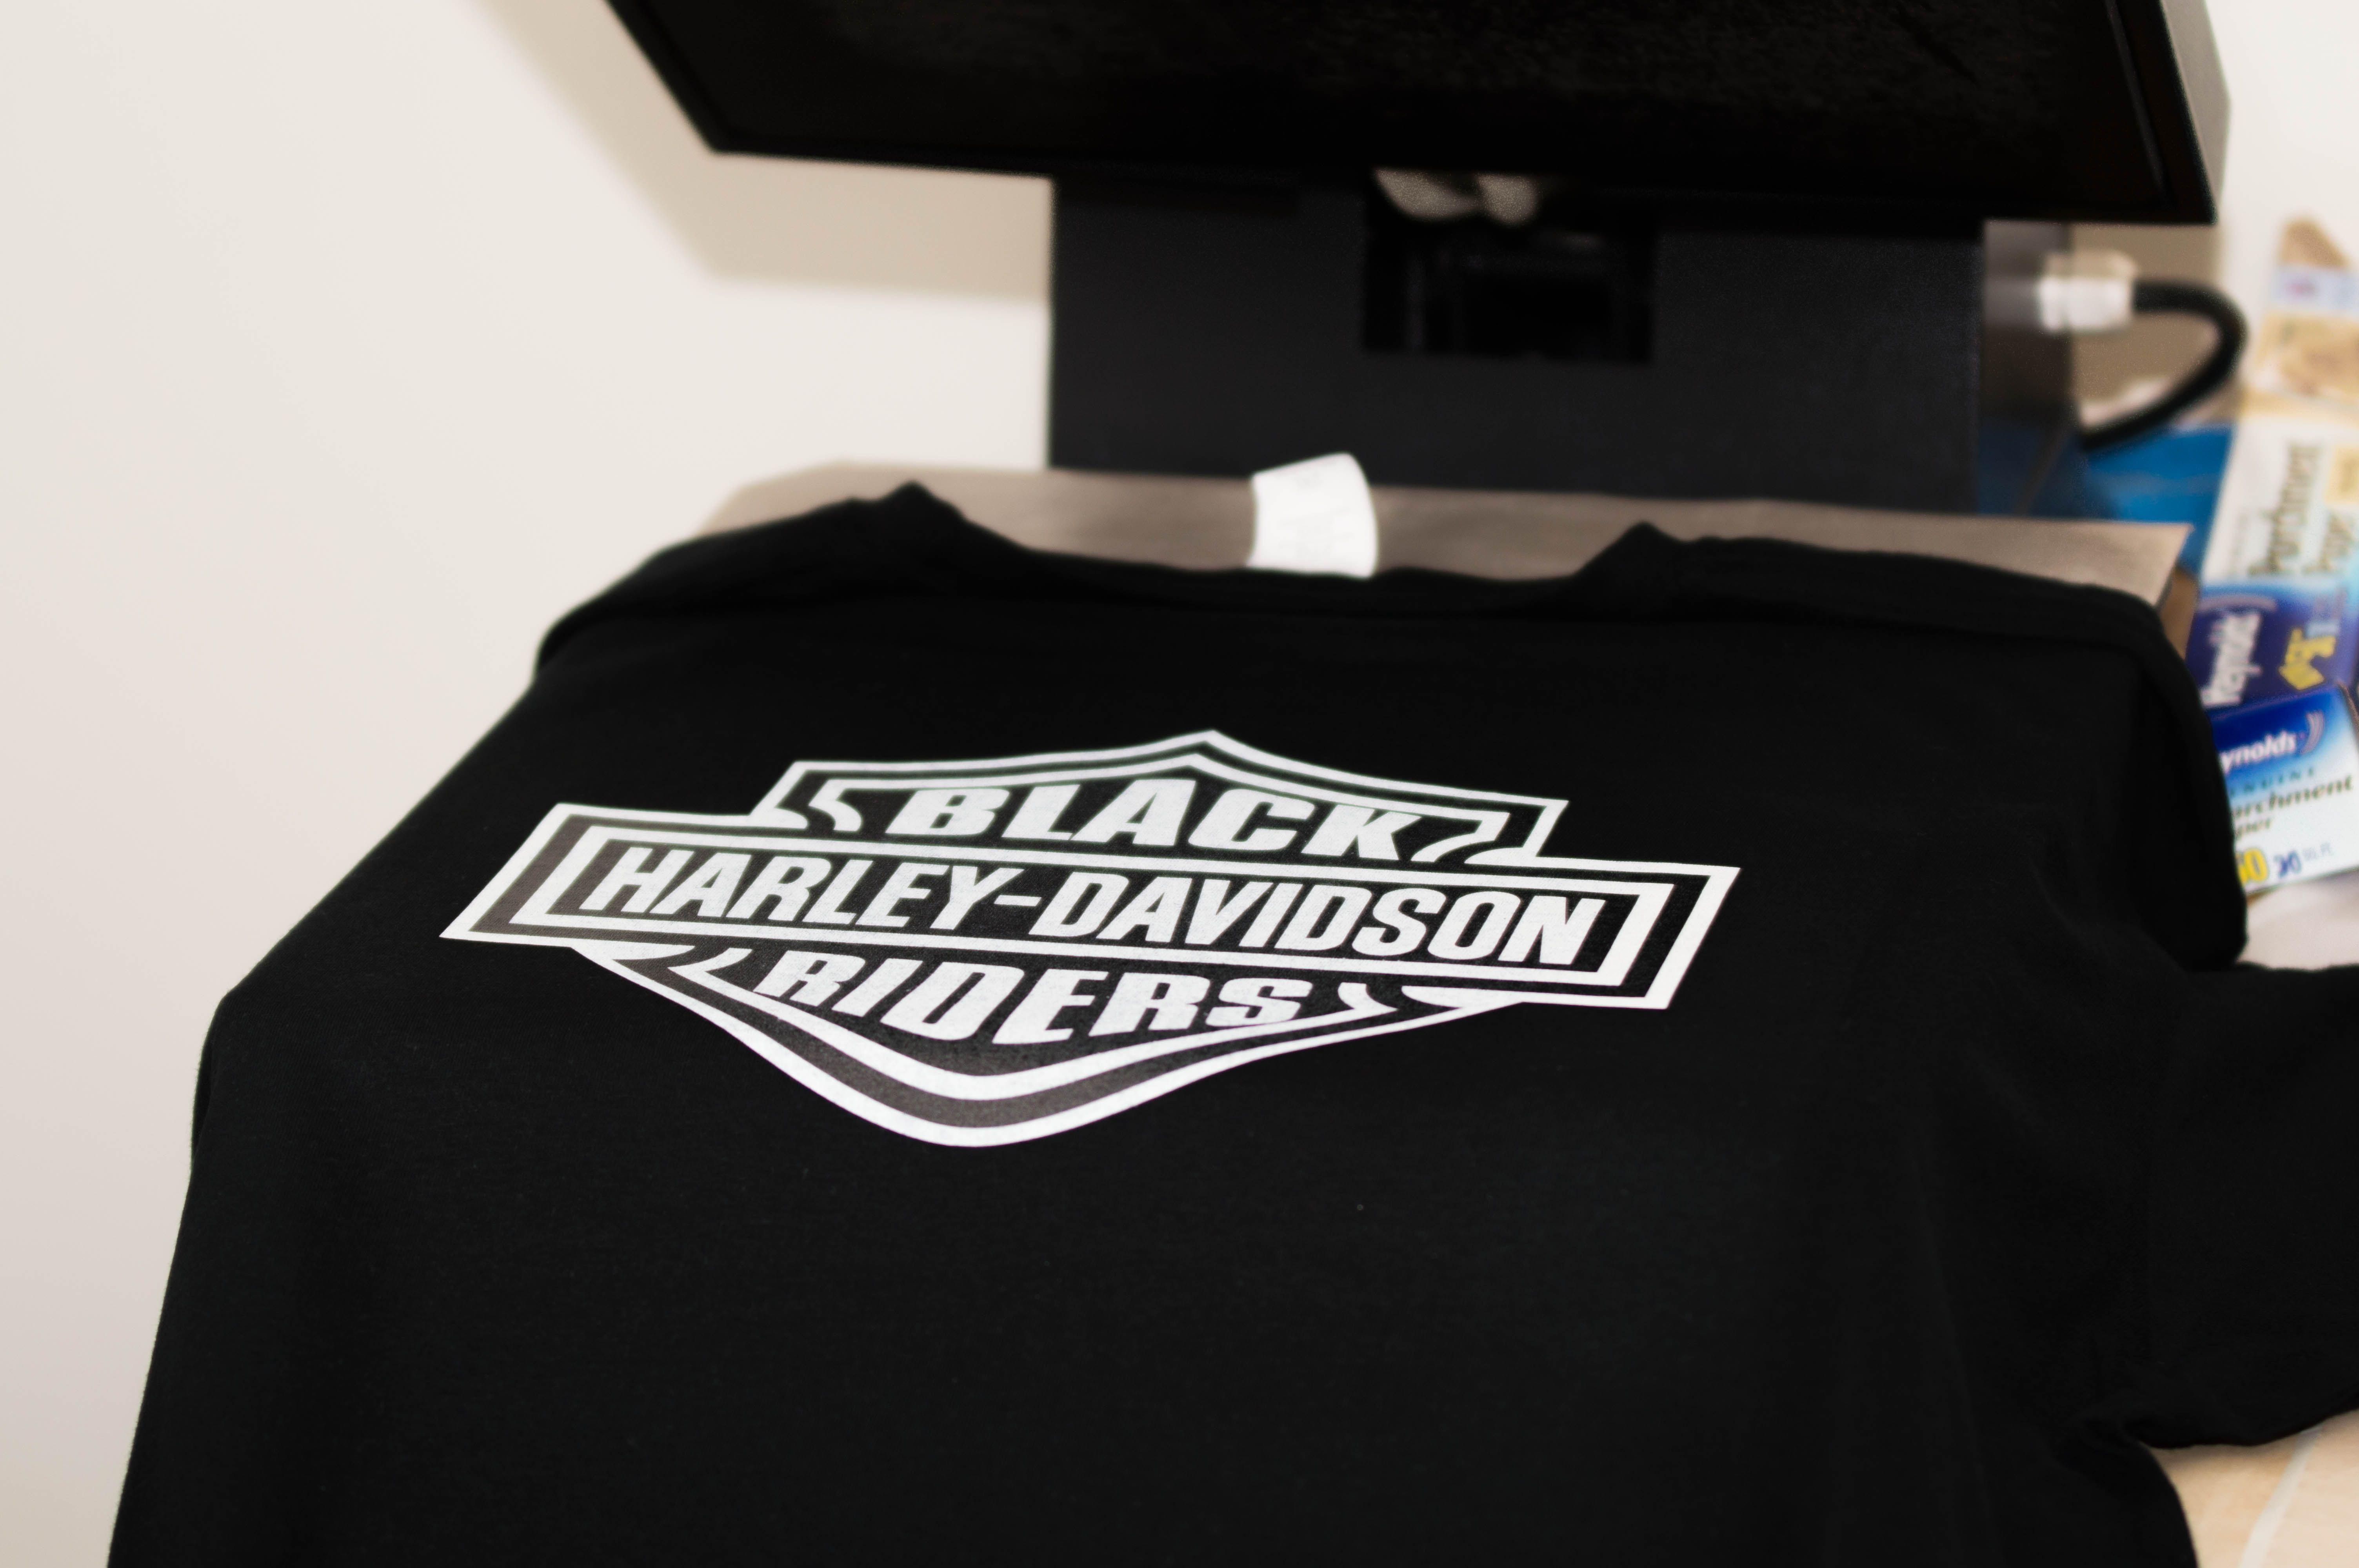 Black Harley Davidson Riders Shirts Custom T Shirt Printing Printed Shirts Black Harley Davidson